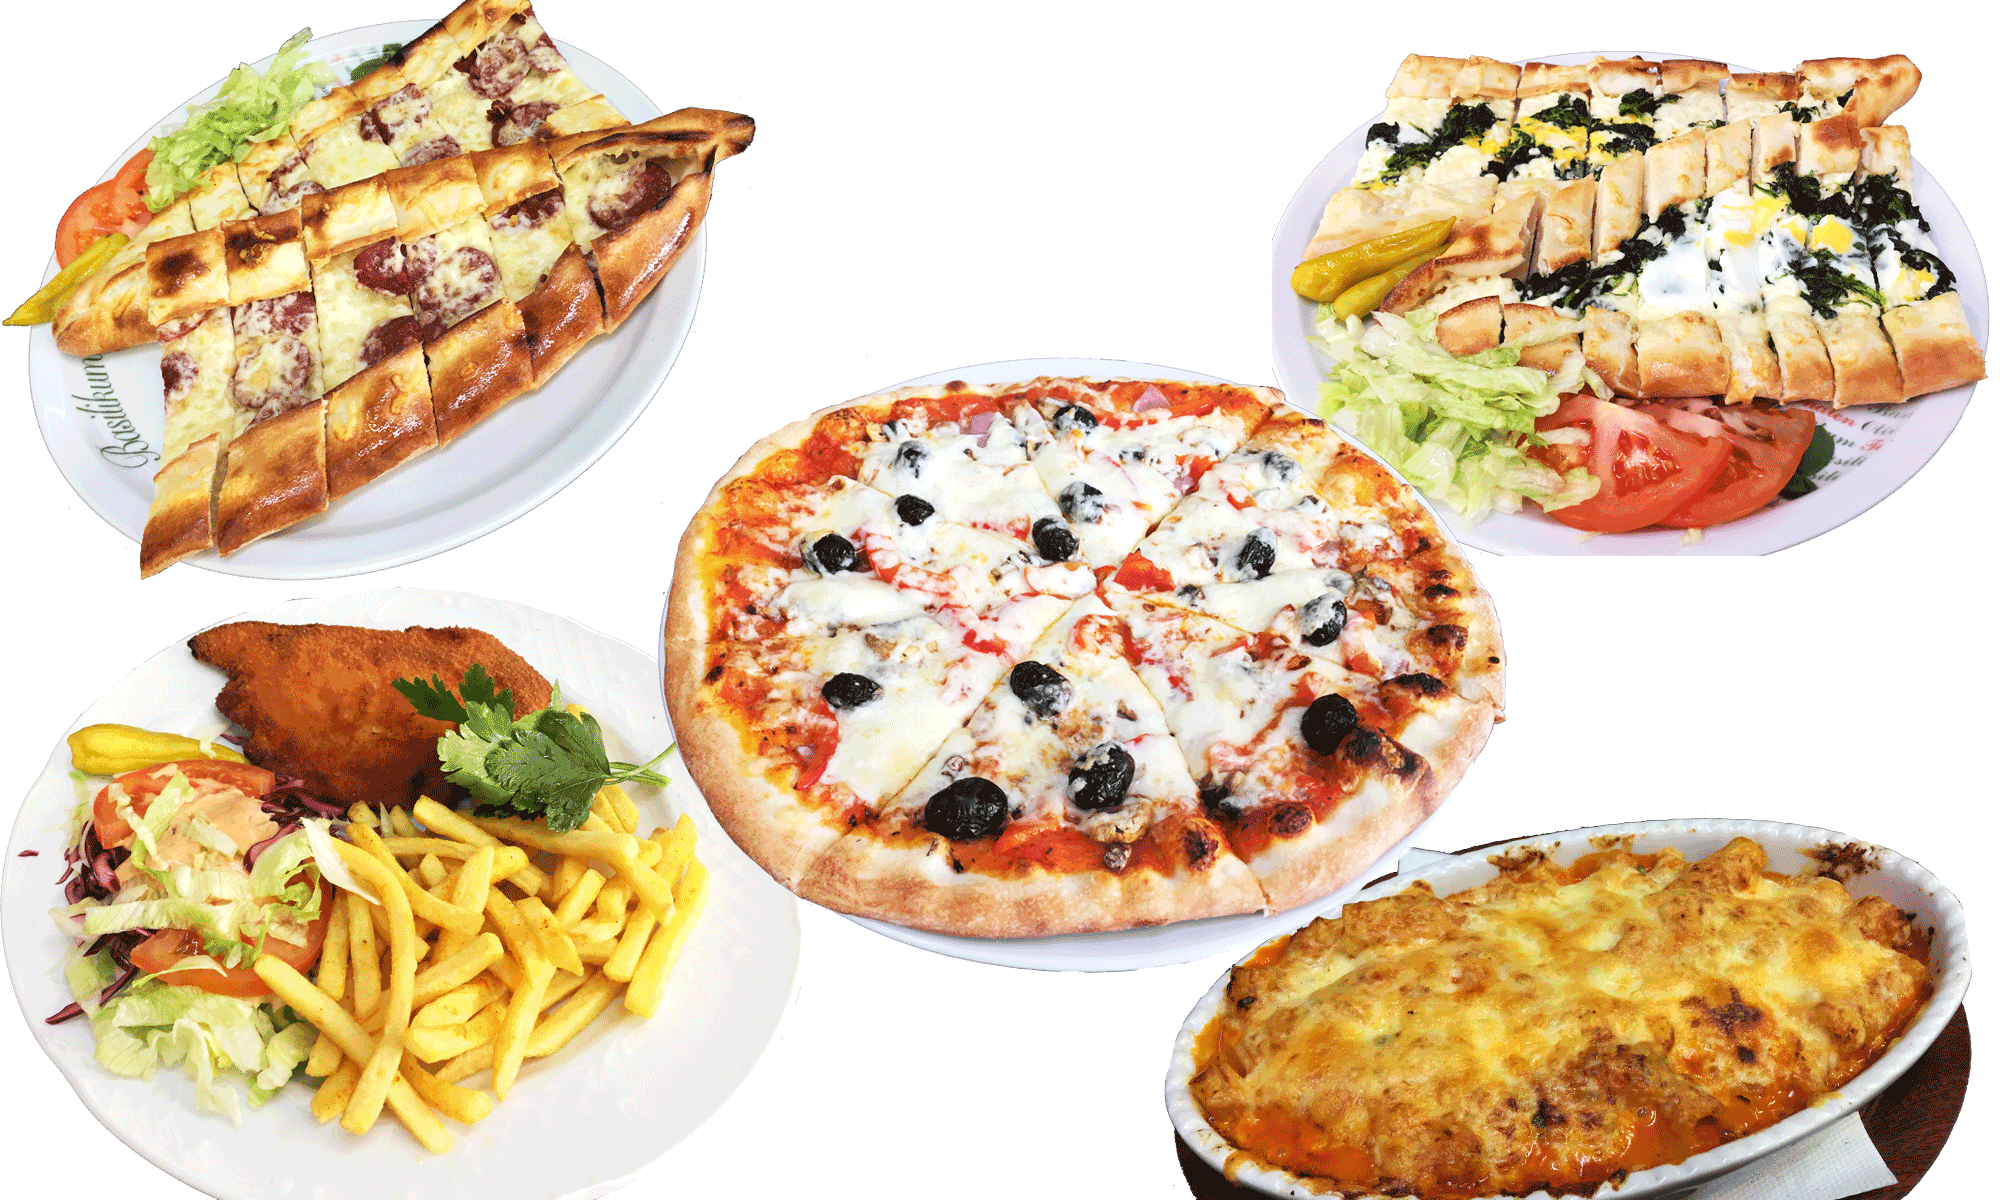 Essen bei Harran Pizza, Pide, Nudeln